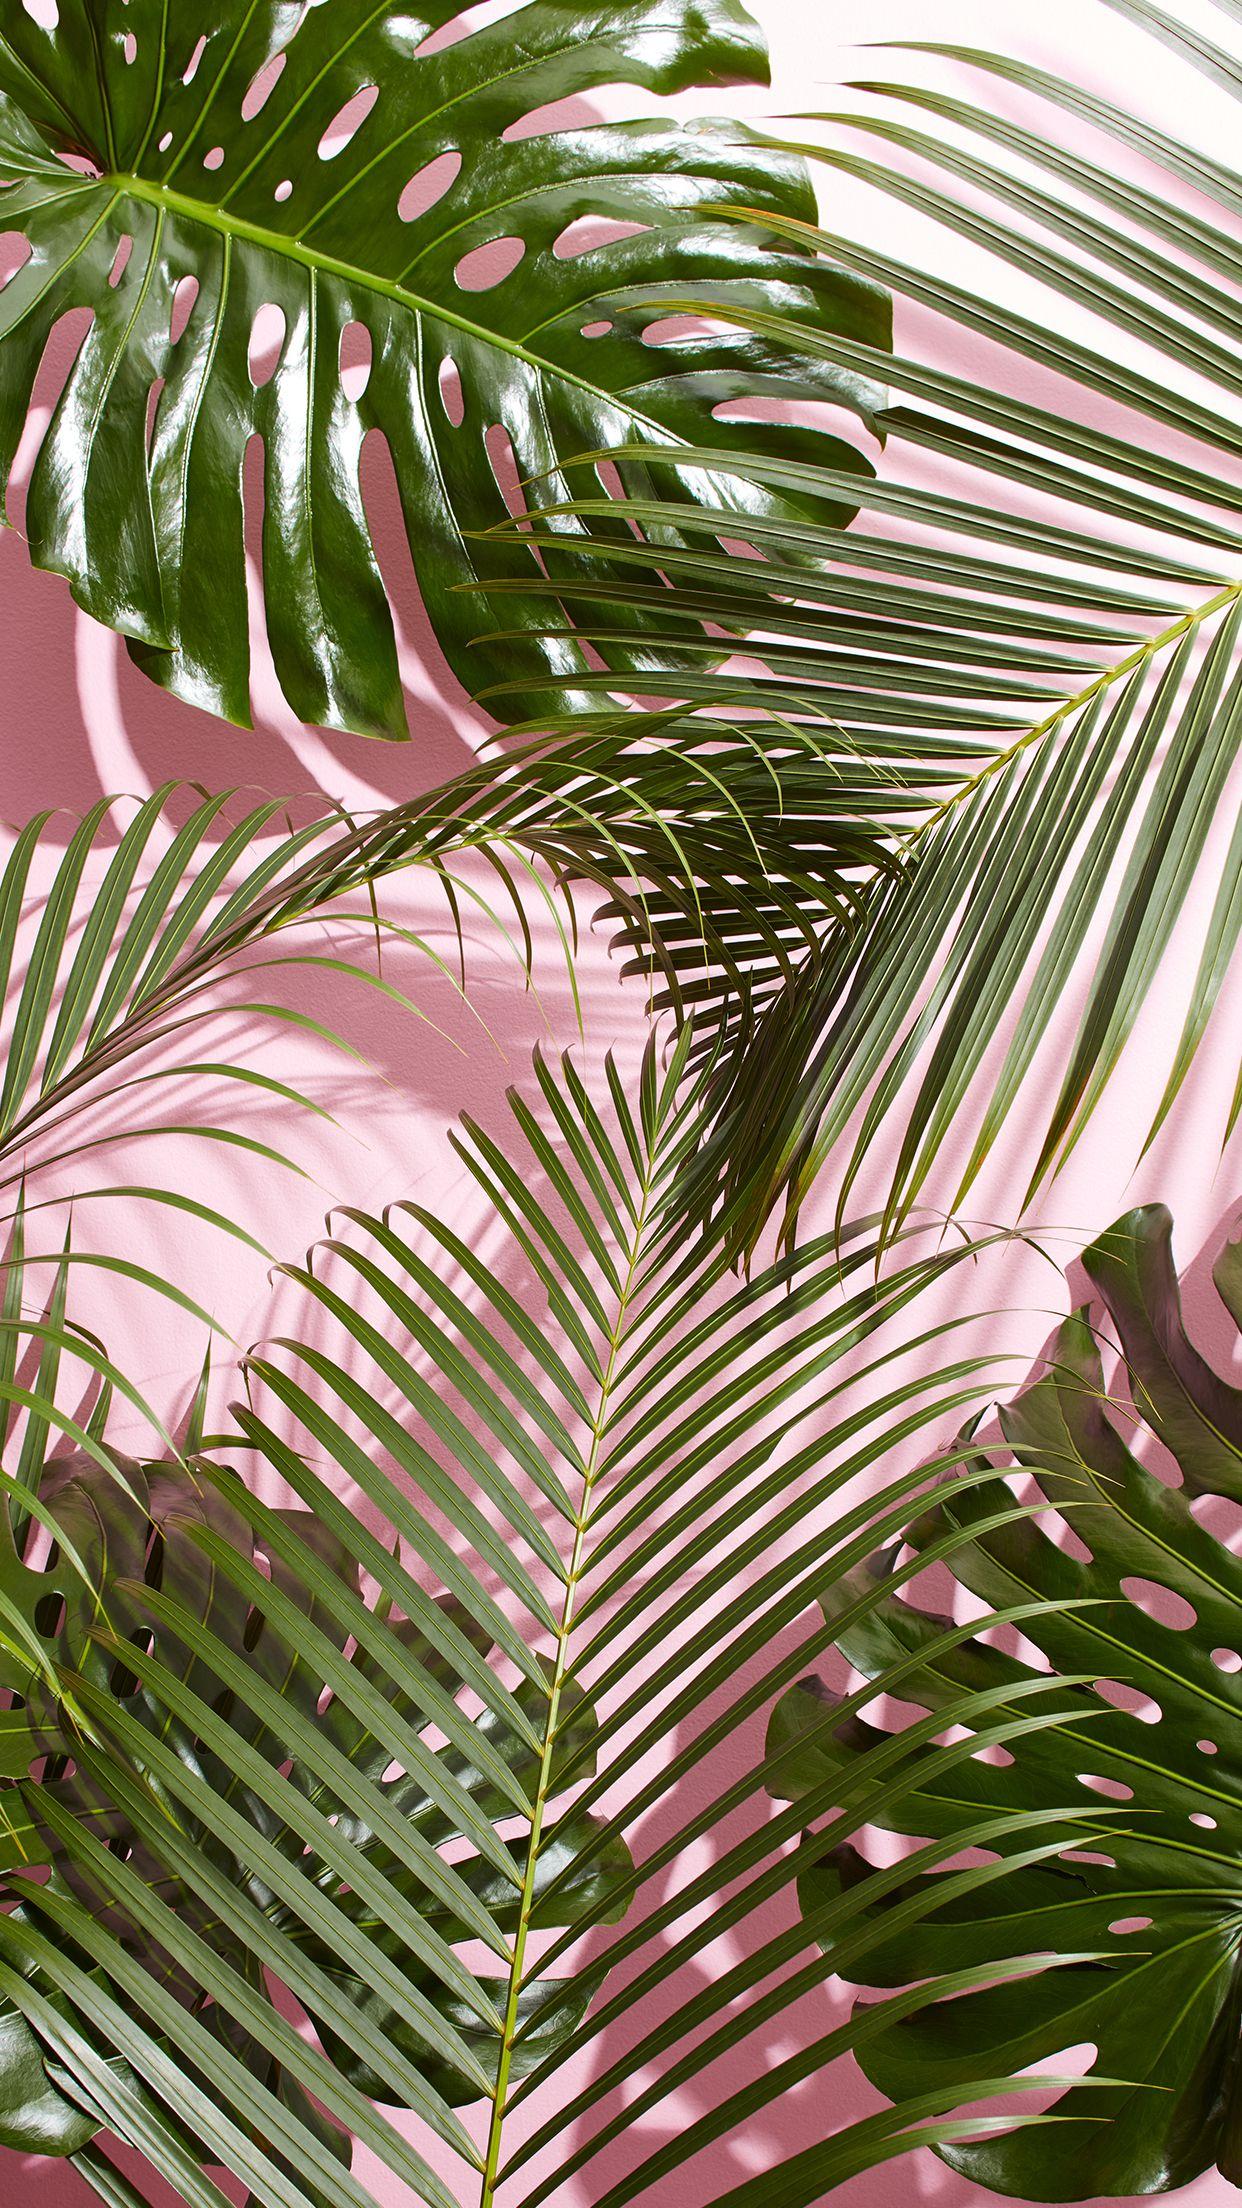 Marvelous West Elm Tropical Leaves Wallpaper (1242×2208)